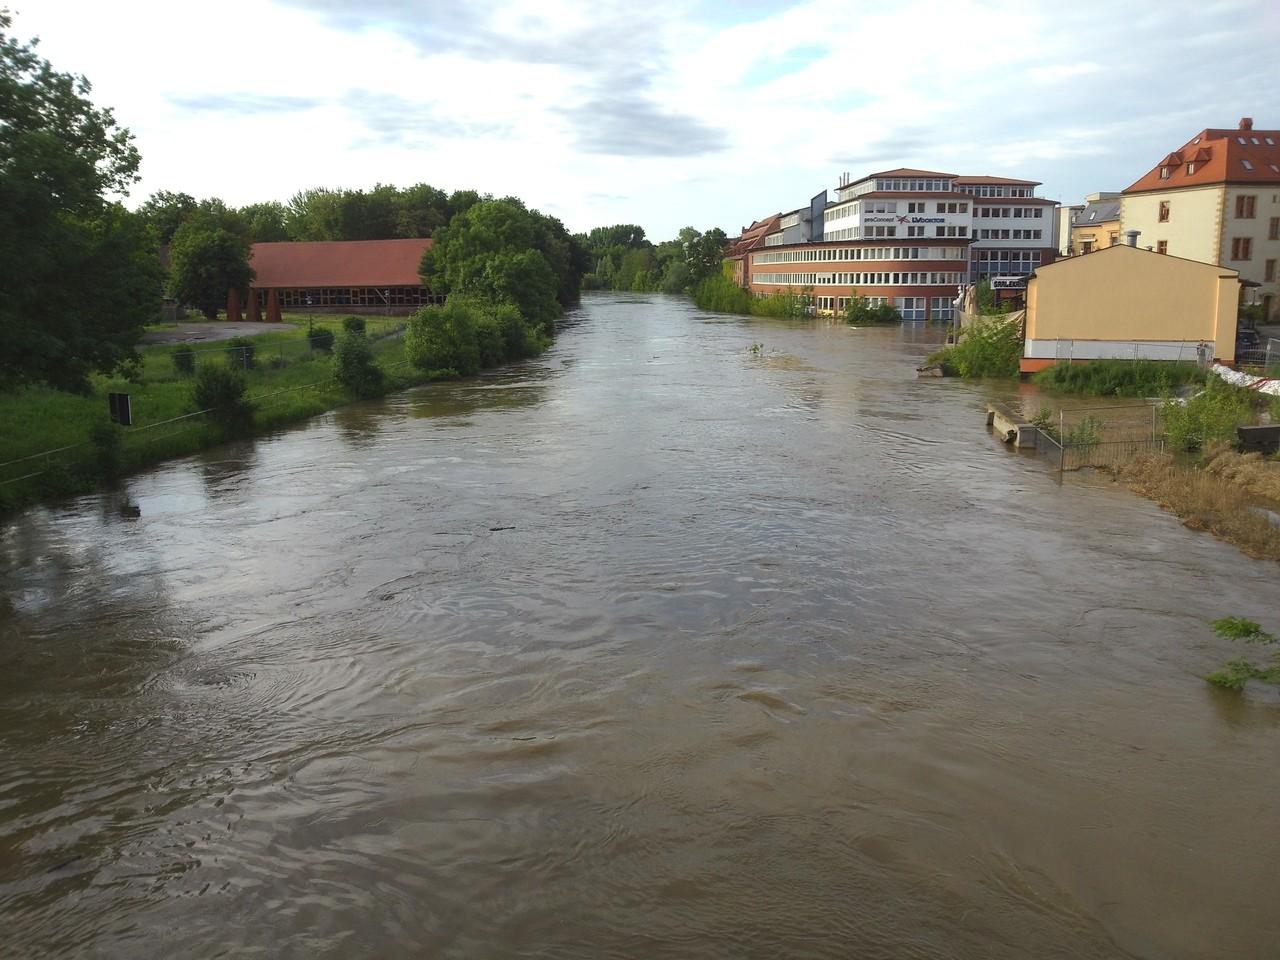 Mansflelder Brücke